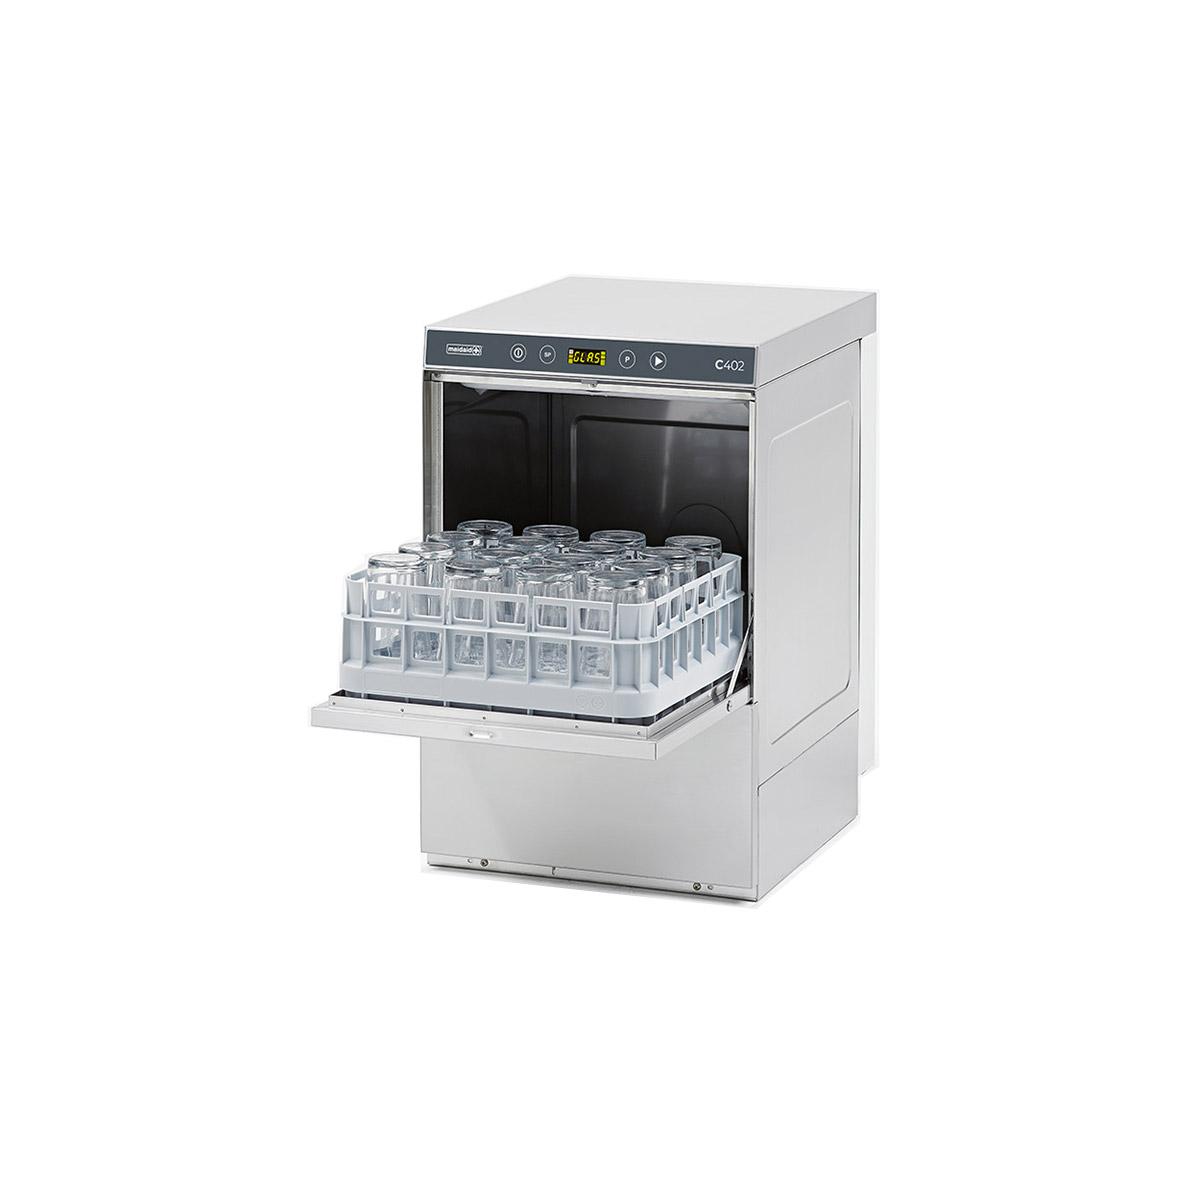 Maidaid Halcyon Glasswasher C402